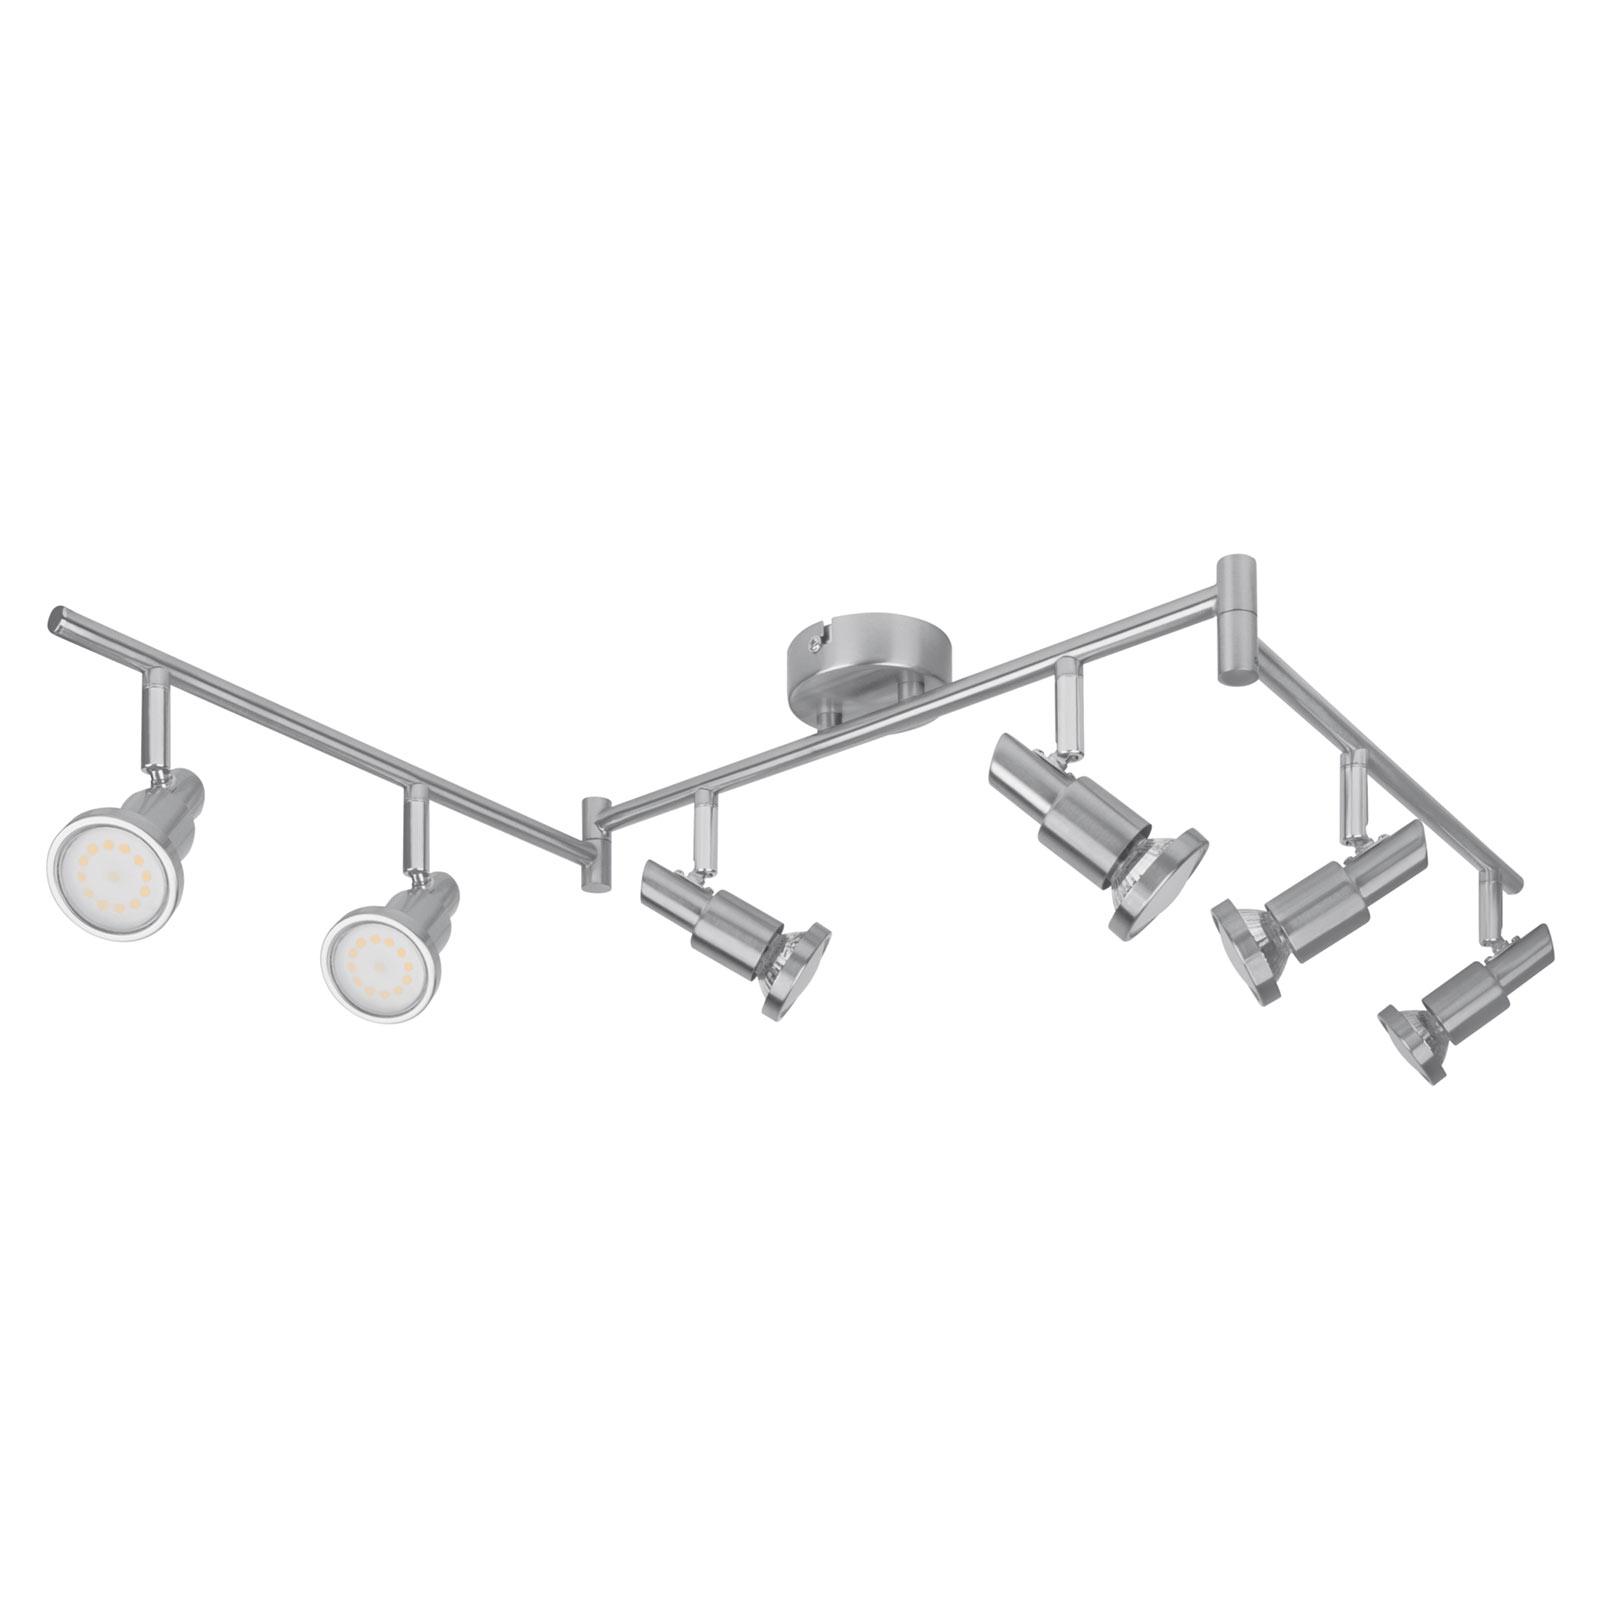 LEDVANCE Niclas LED-Strahler, nickel, 6flg.